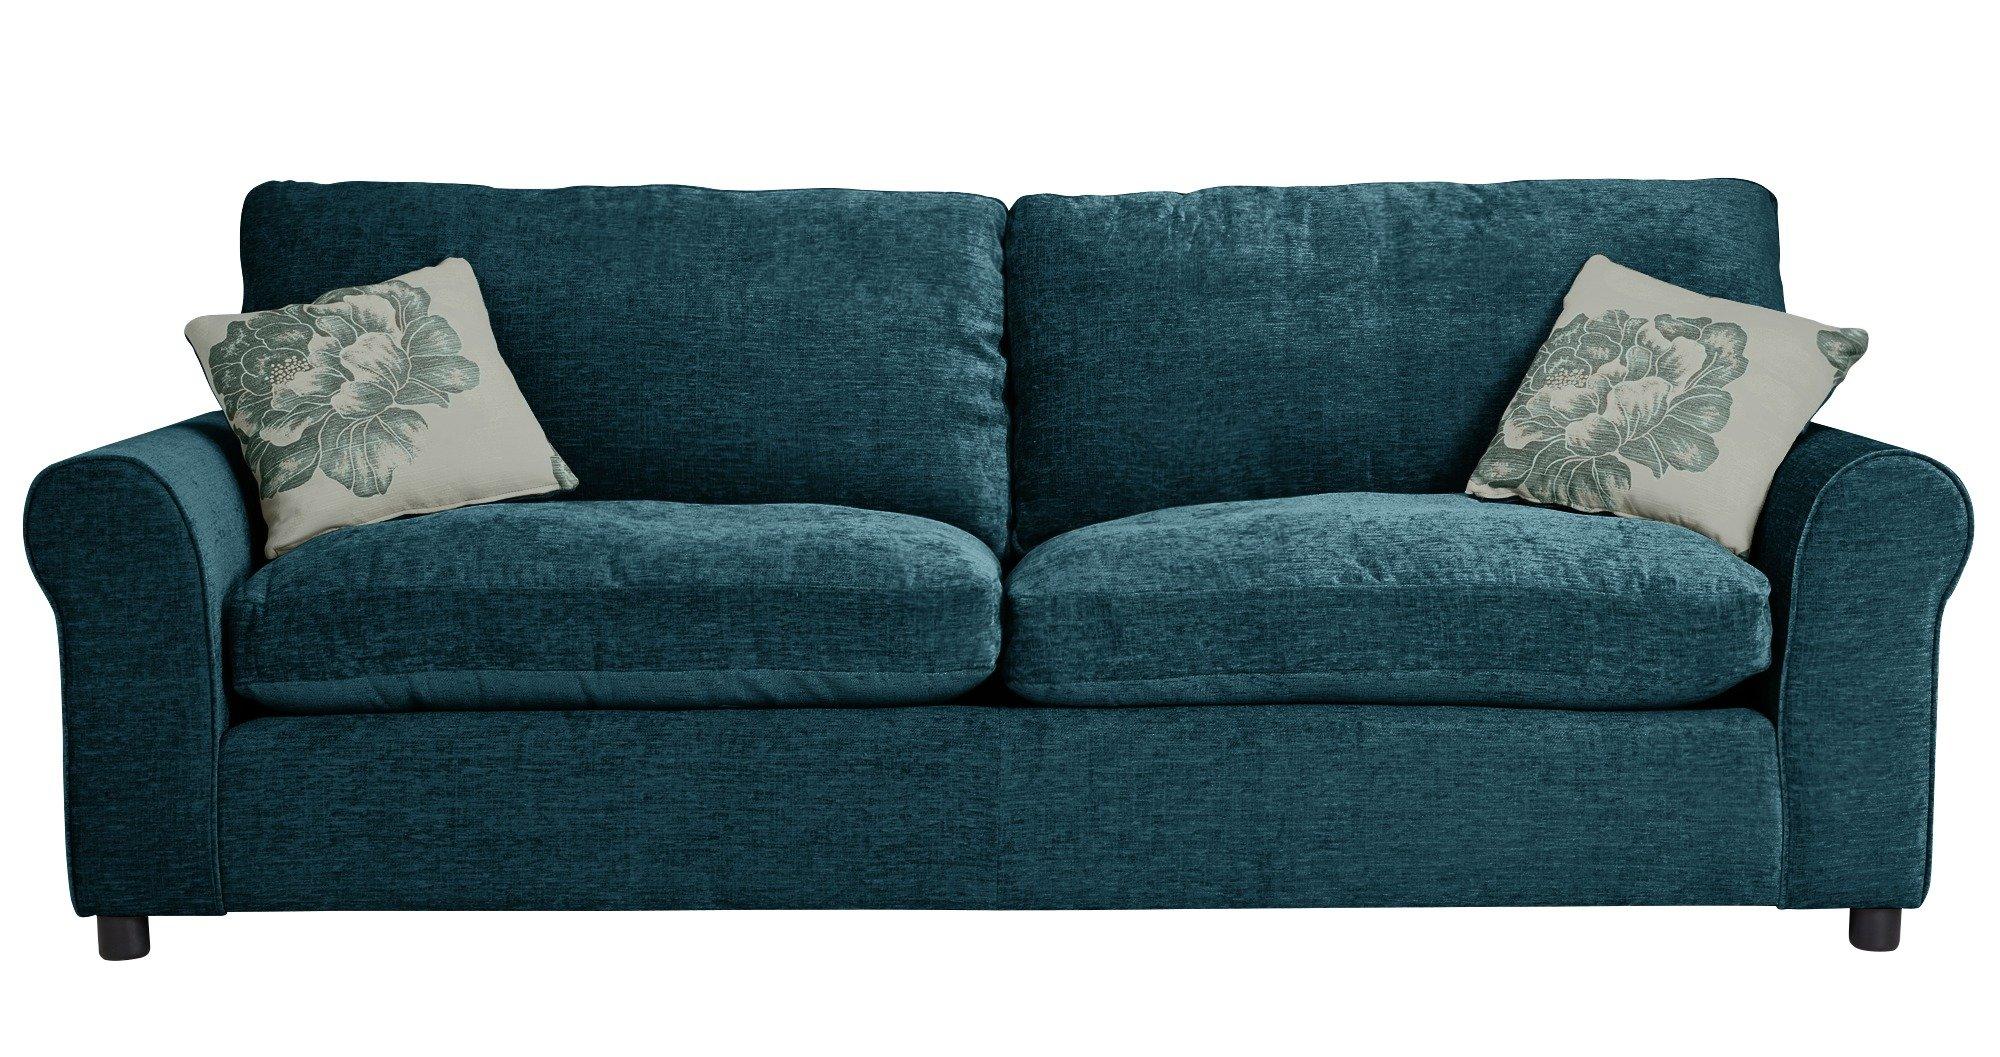 Great HOME Tessa 4 Seater Fabric Sofa   Teal